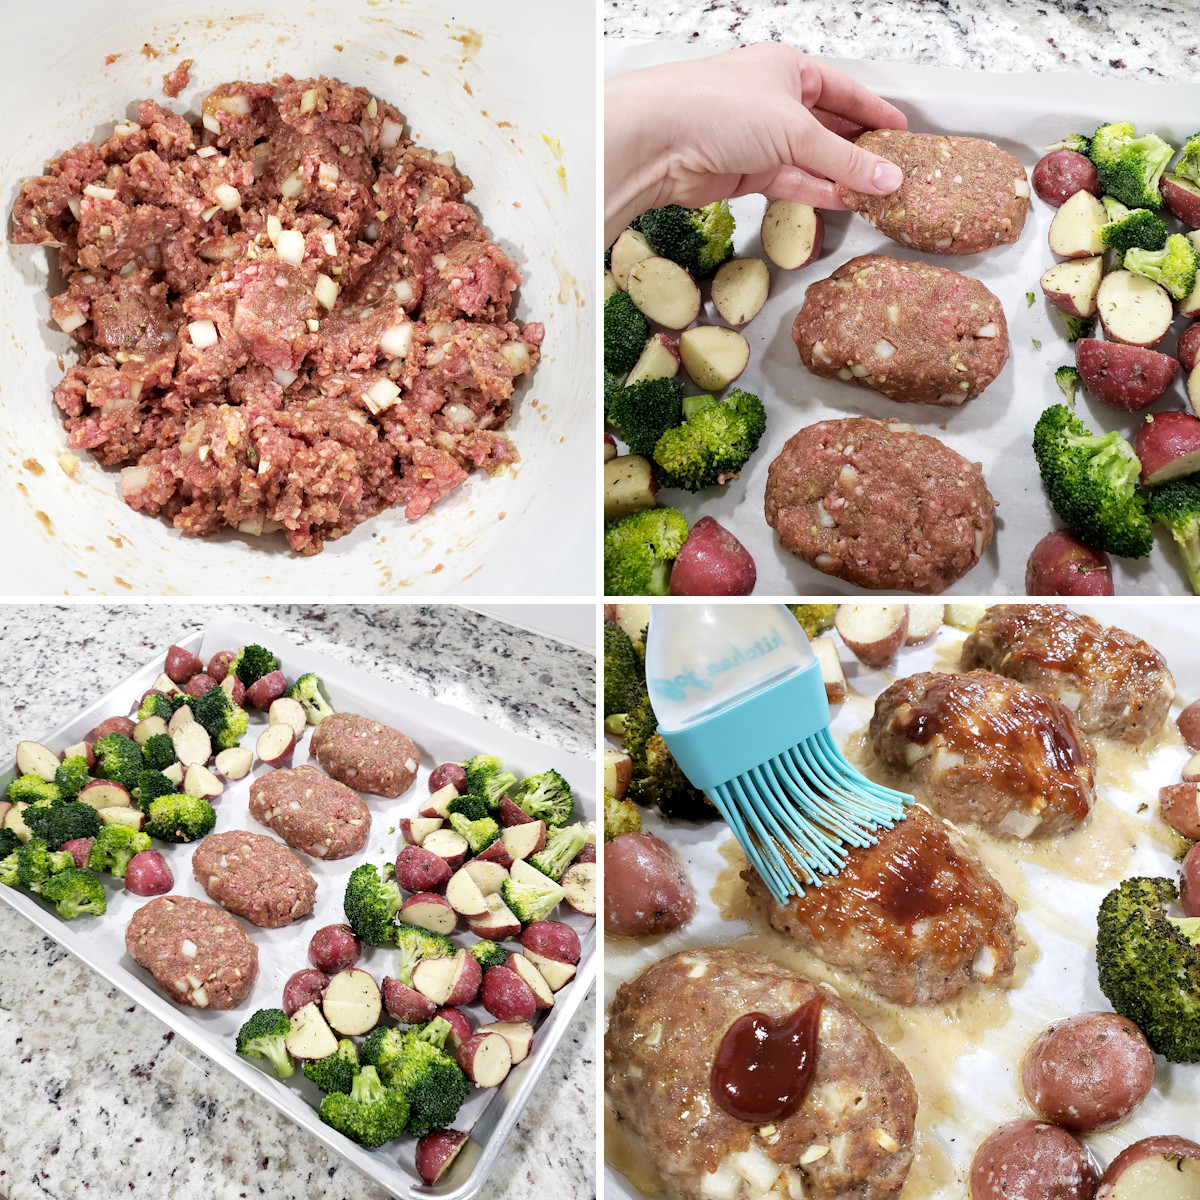 Assembling mini meatloaves on a sheet pan.